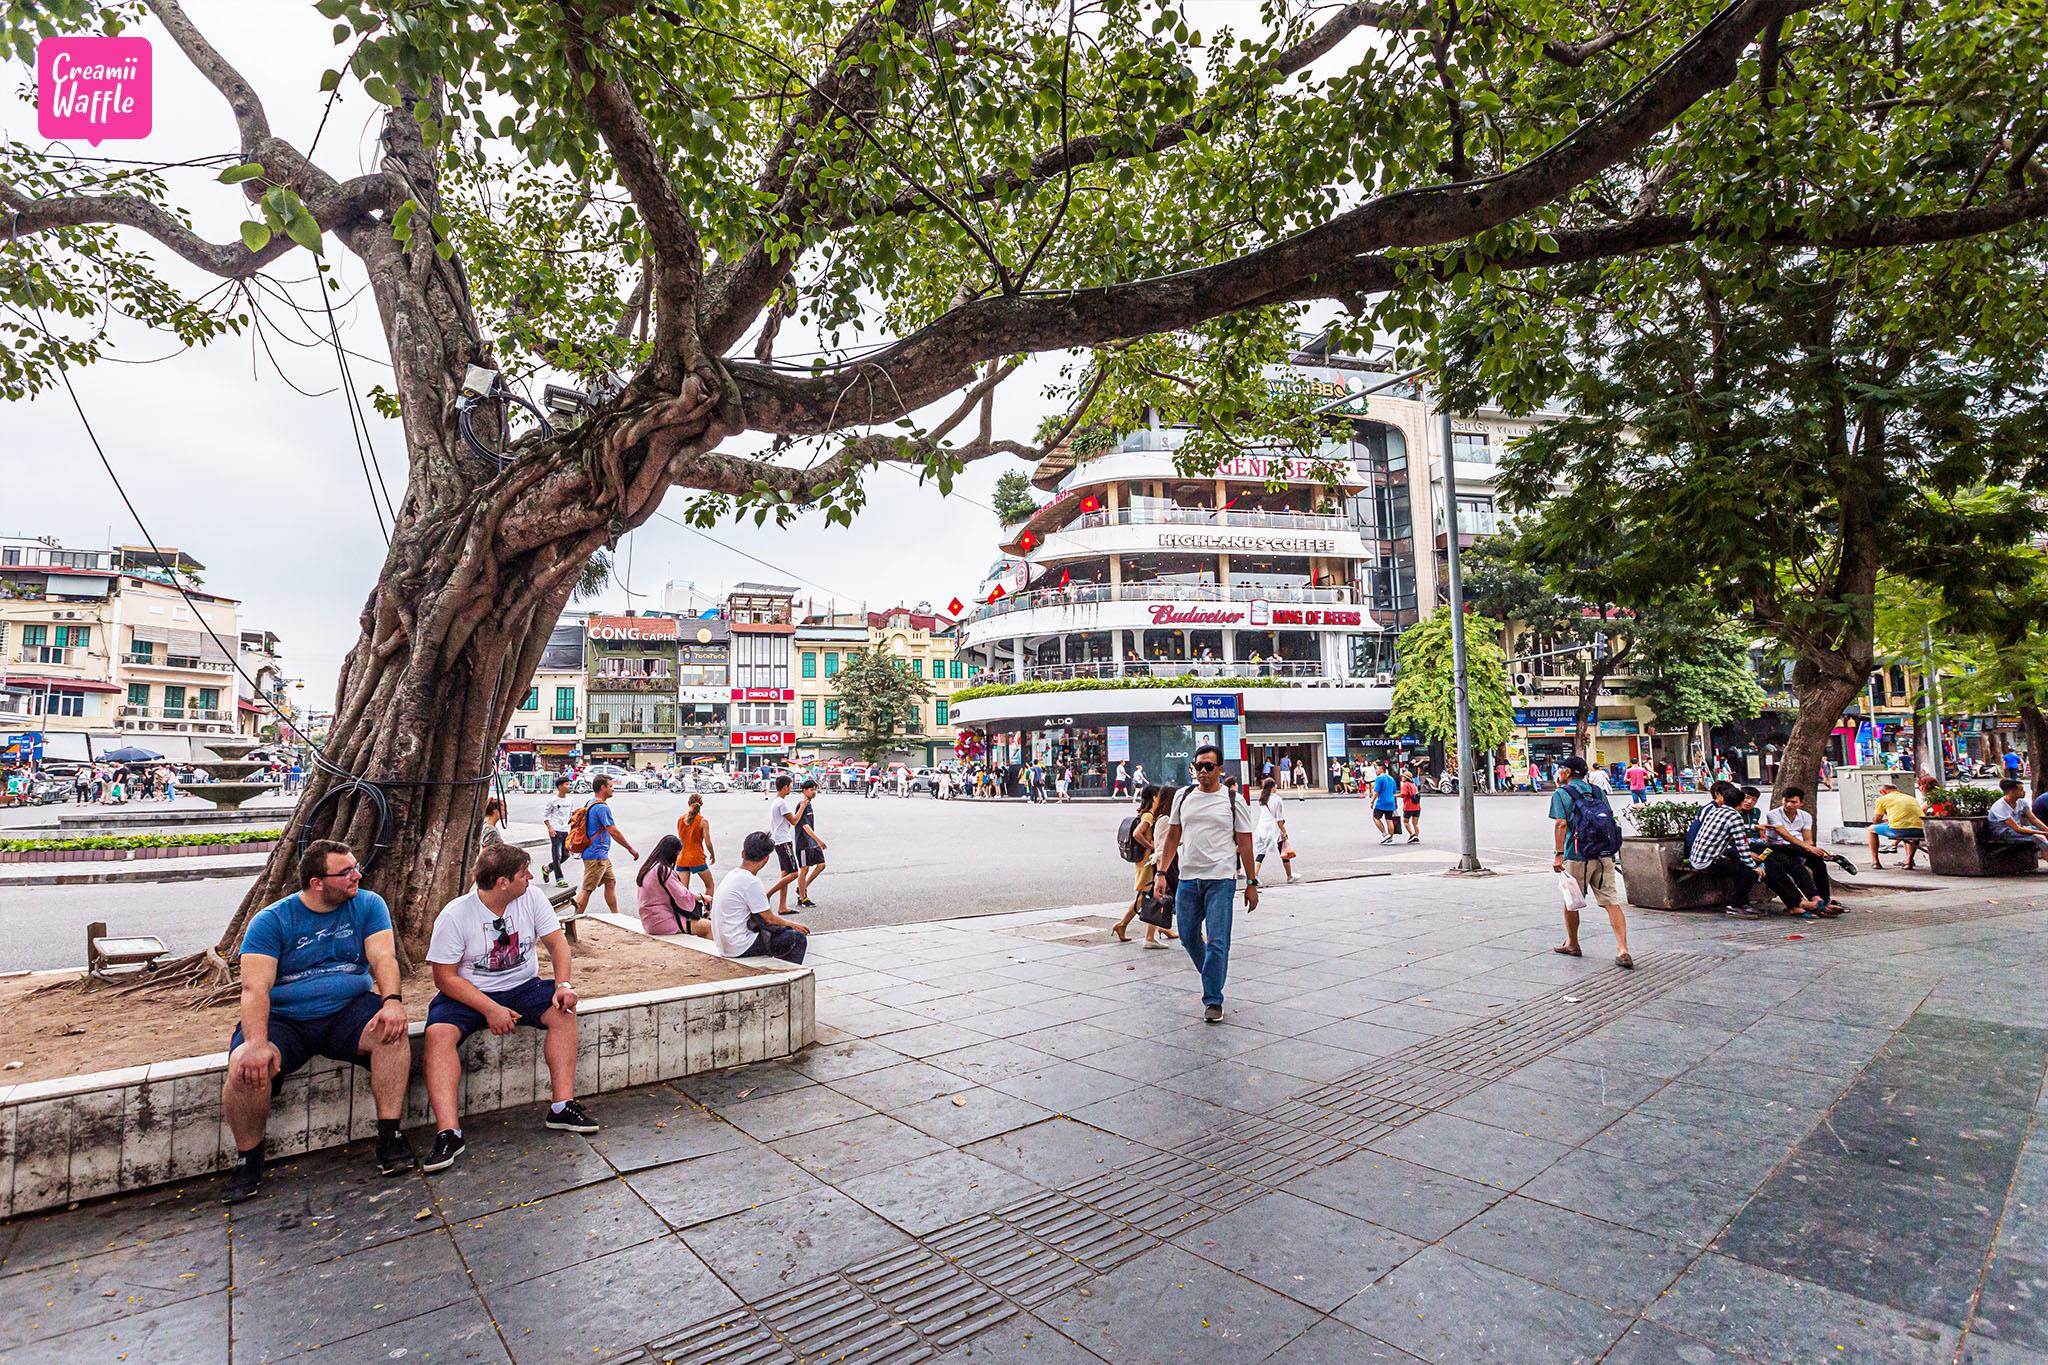 Dong Kinh Nghia Thuc Square